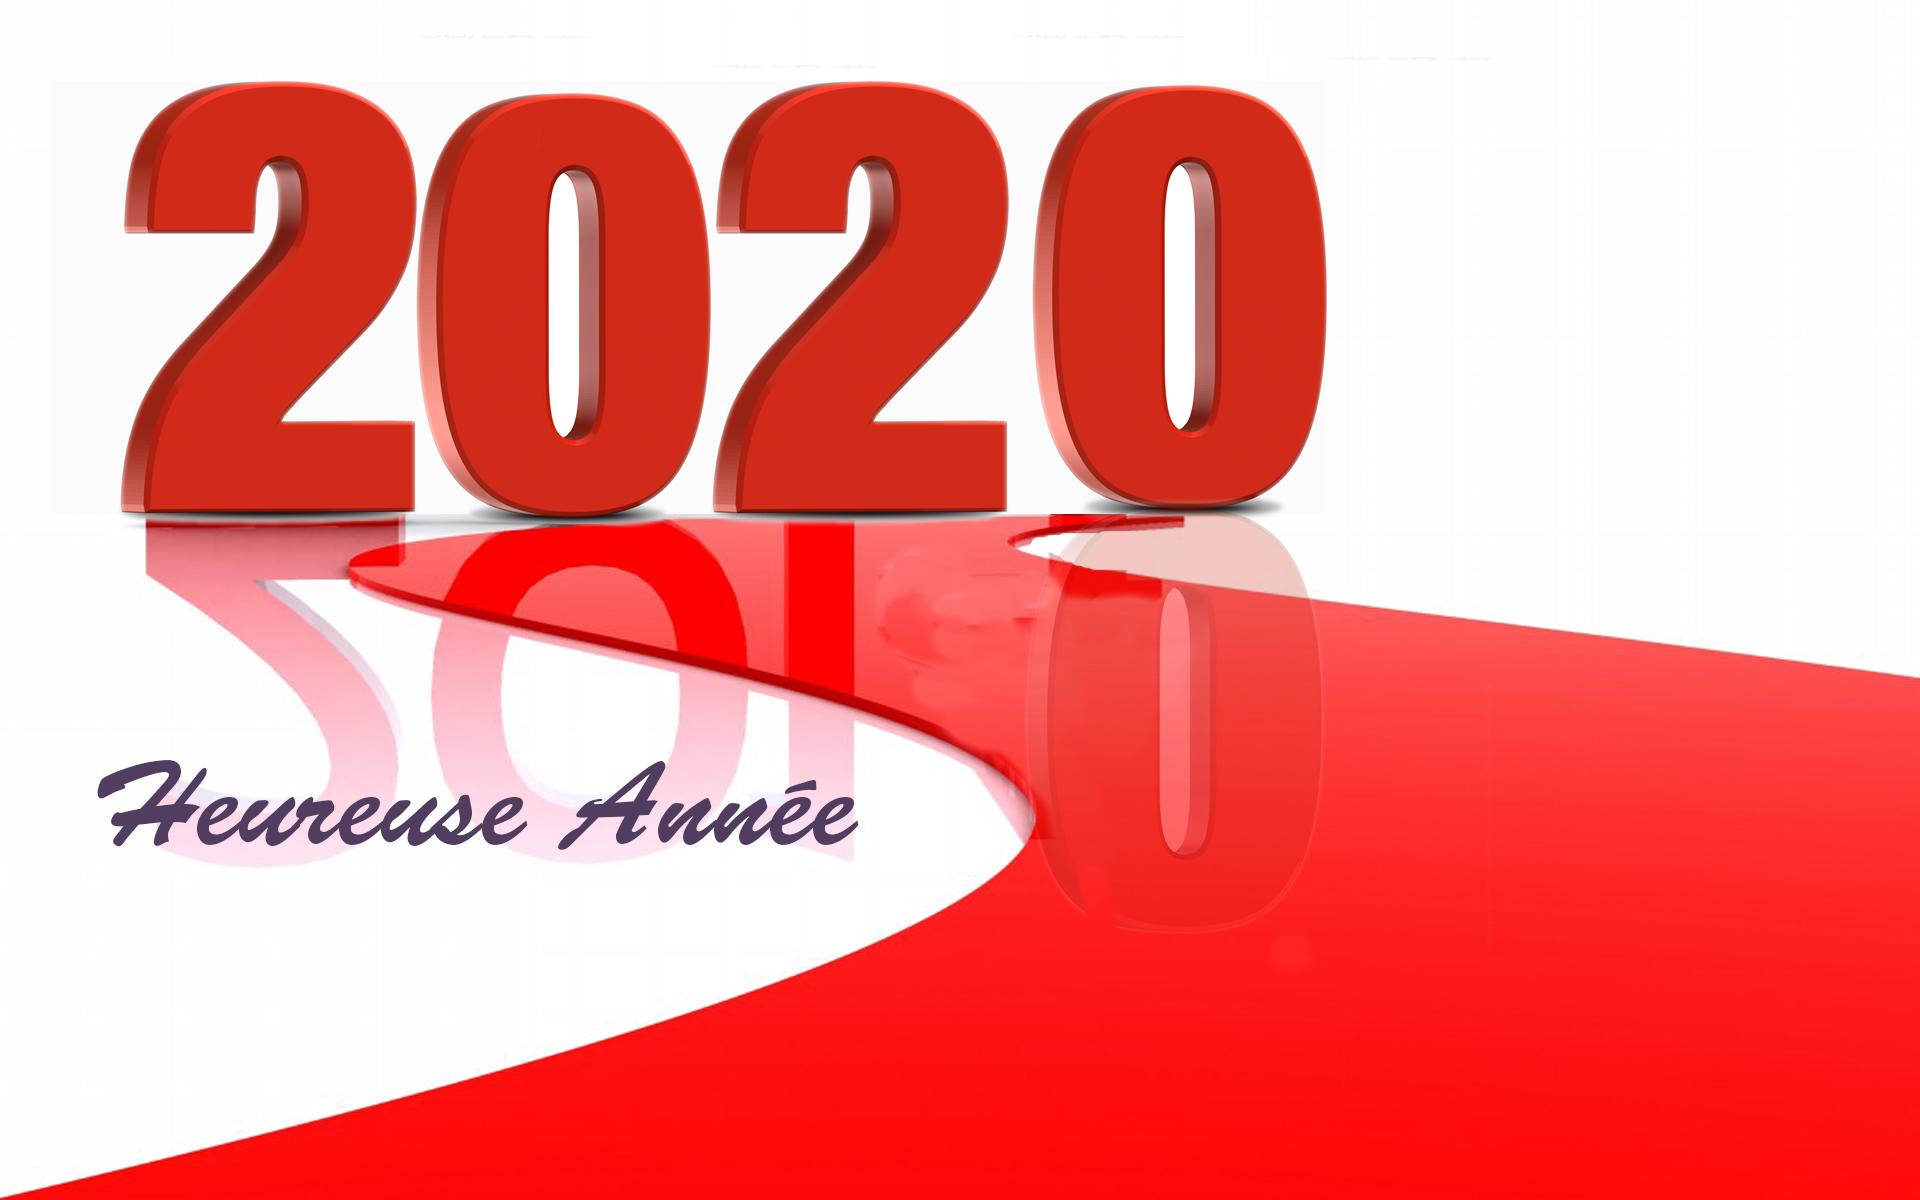 heureuse-annee-2020